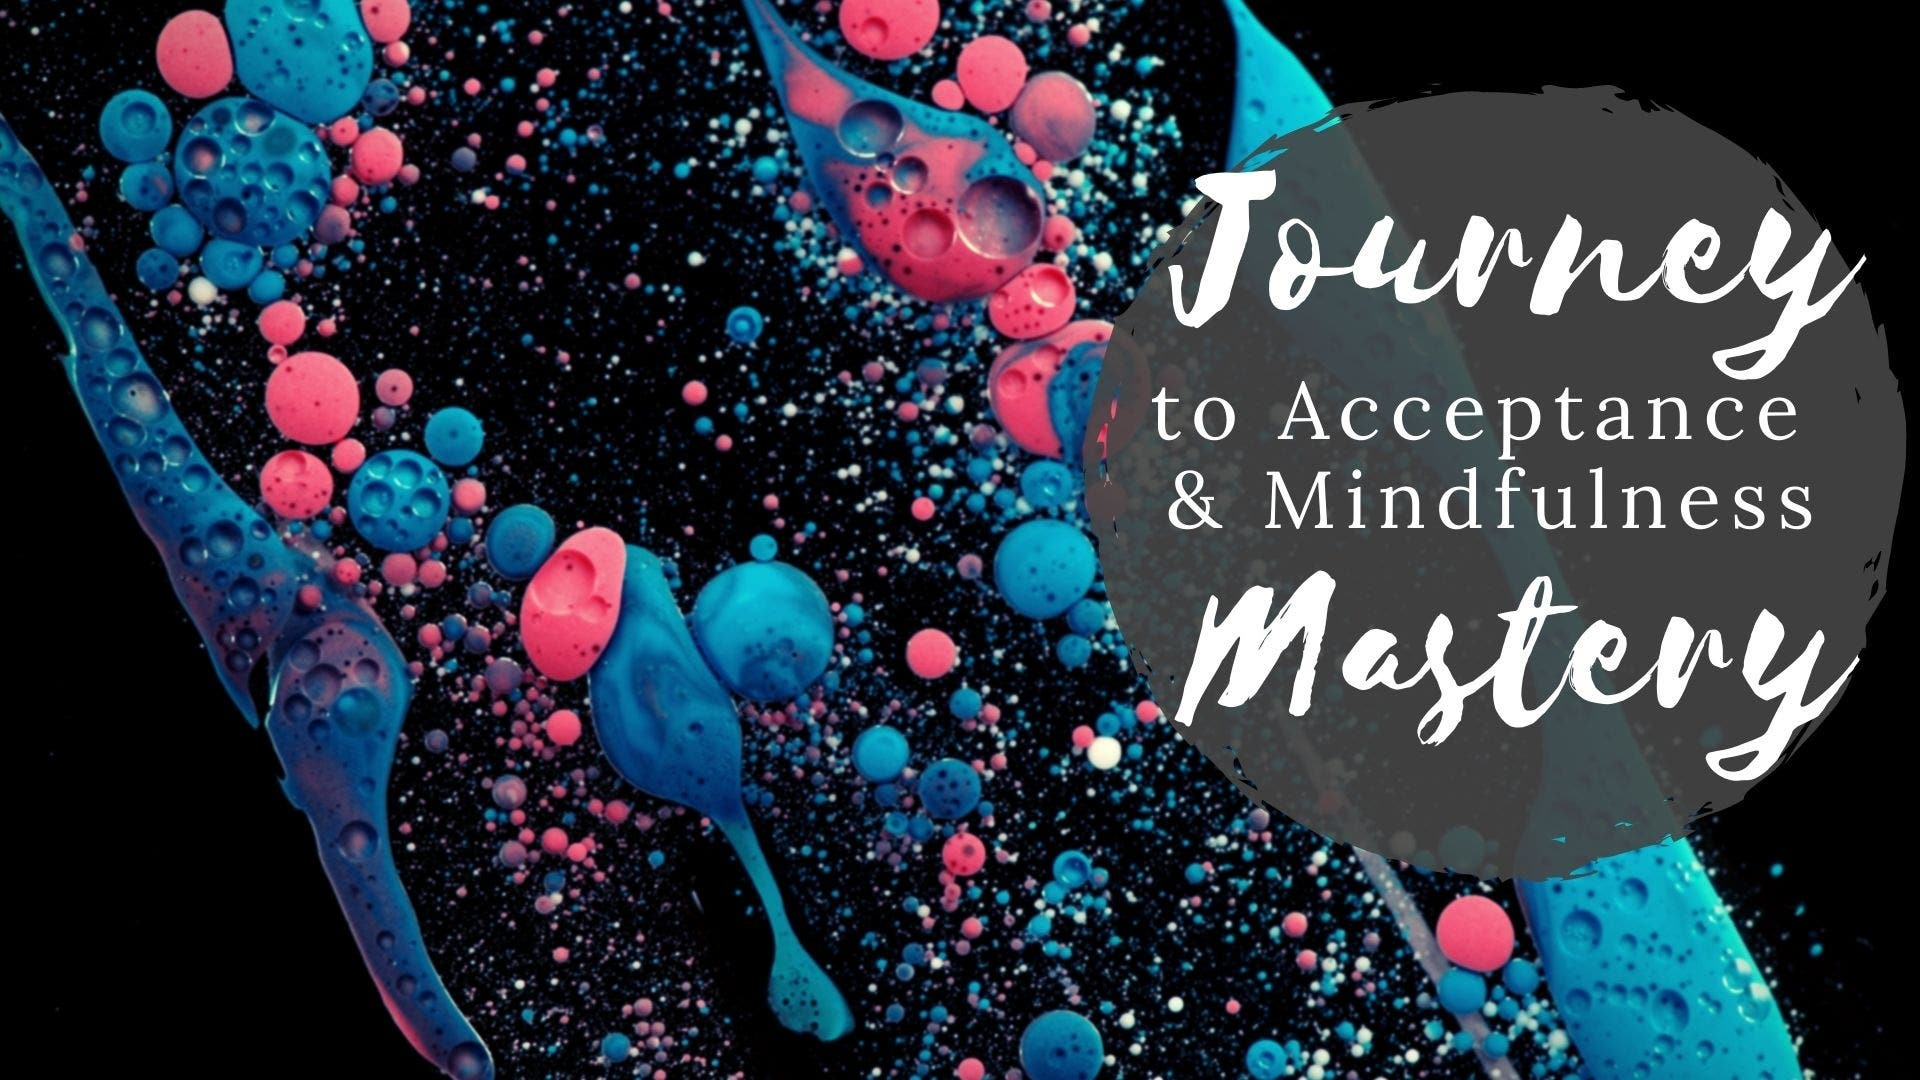 Journey to Acceptance & Mindfulness Mastery